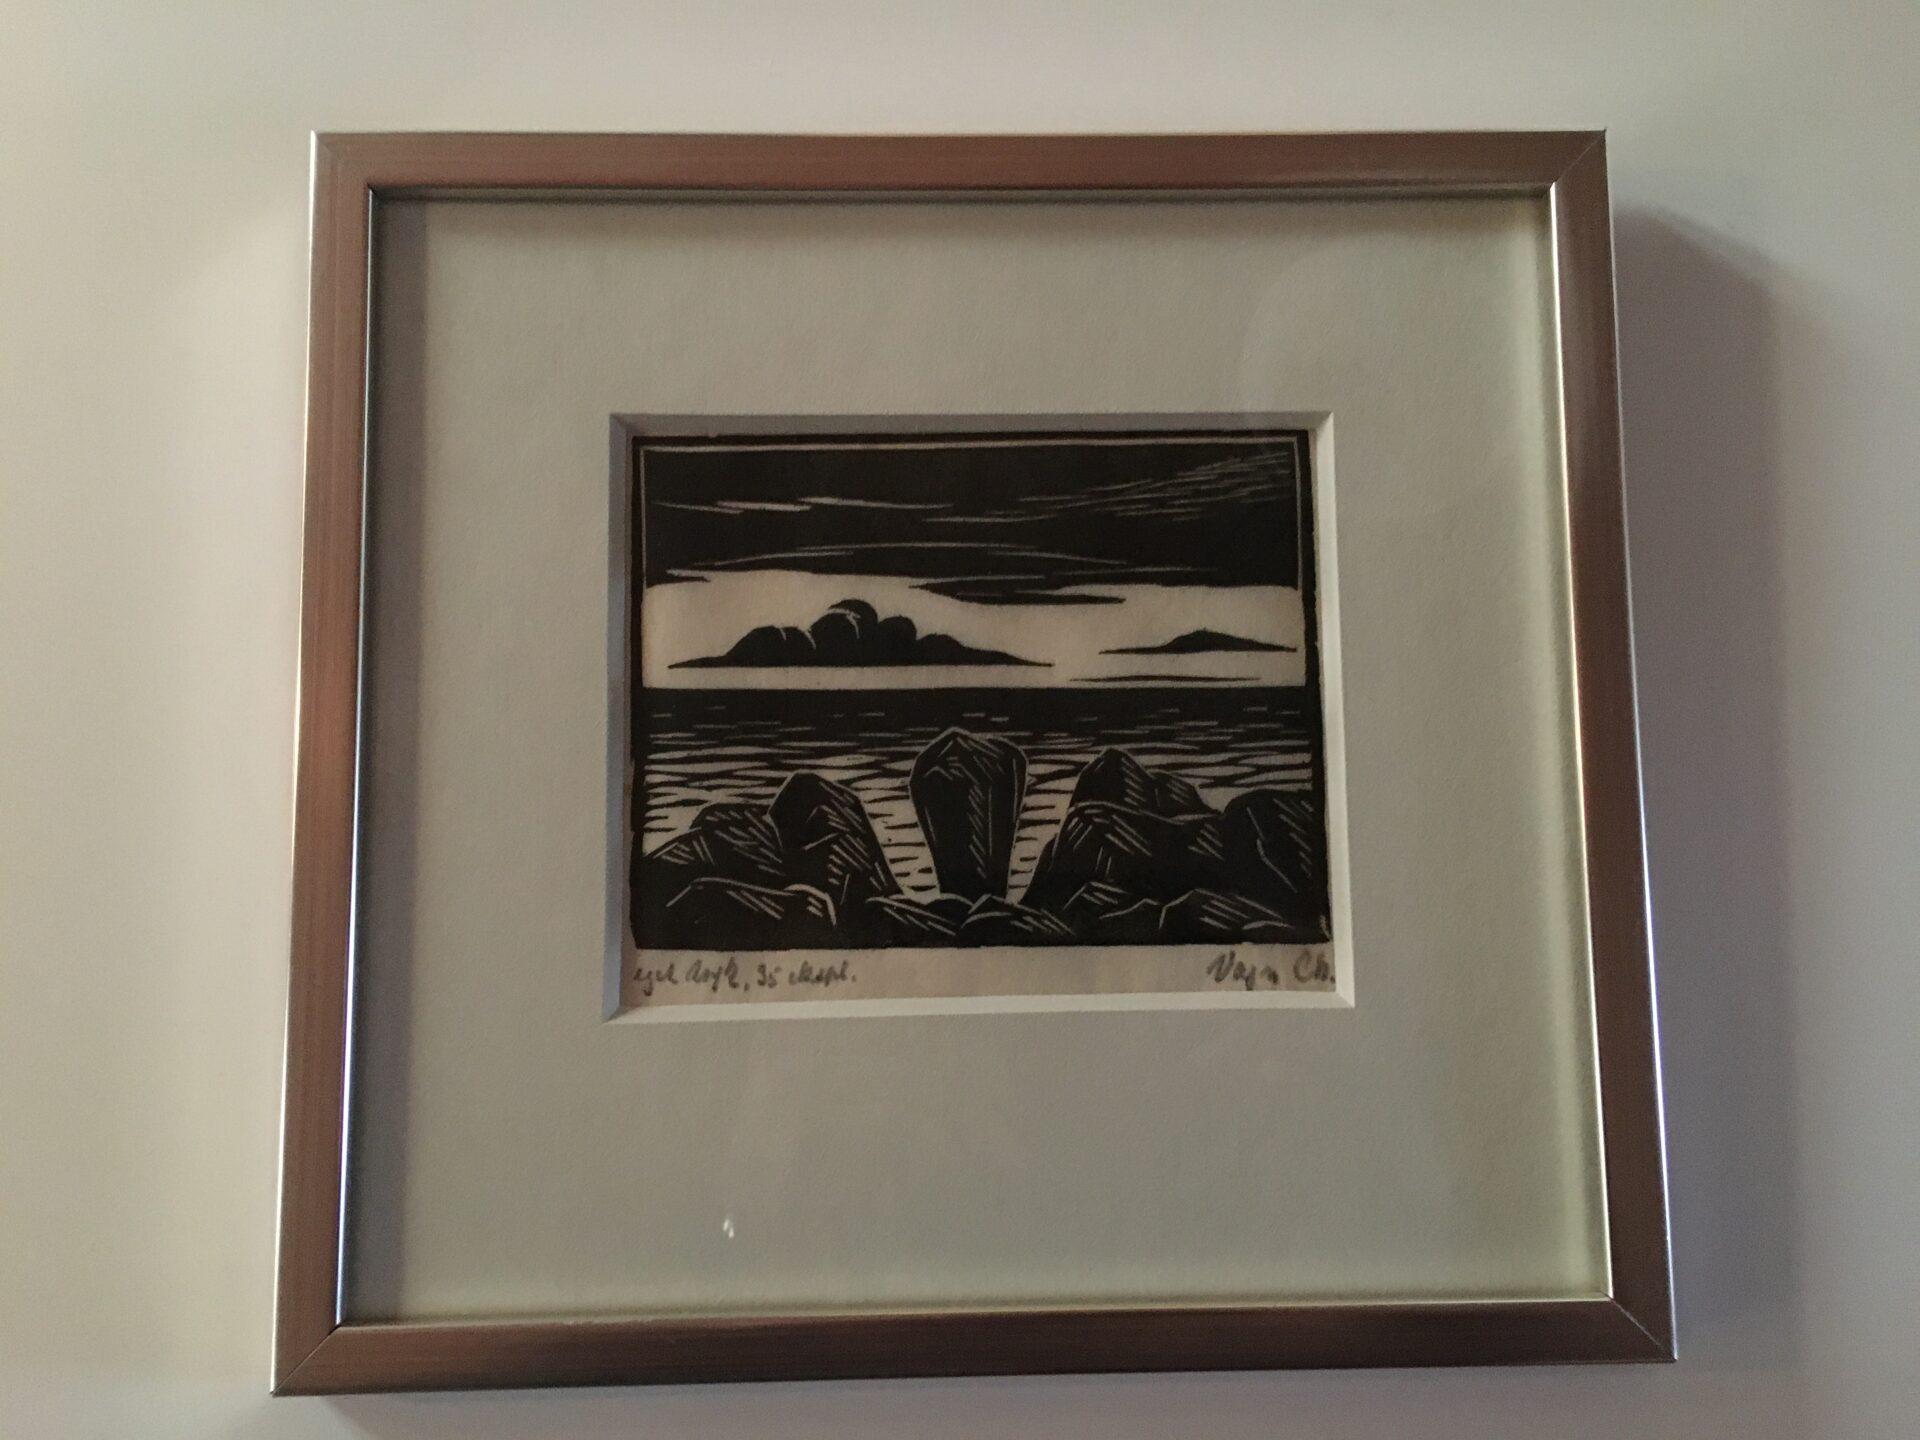 Vagn Christensen, træsnit, (rammemål 25x27 cm), sign Vagn Ch. 35 eksmpl. pris 300 kr